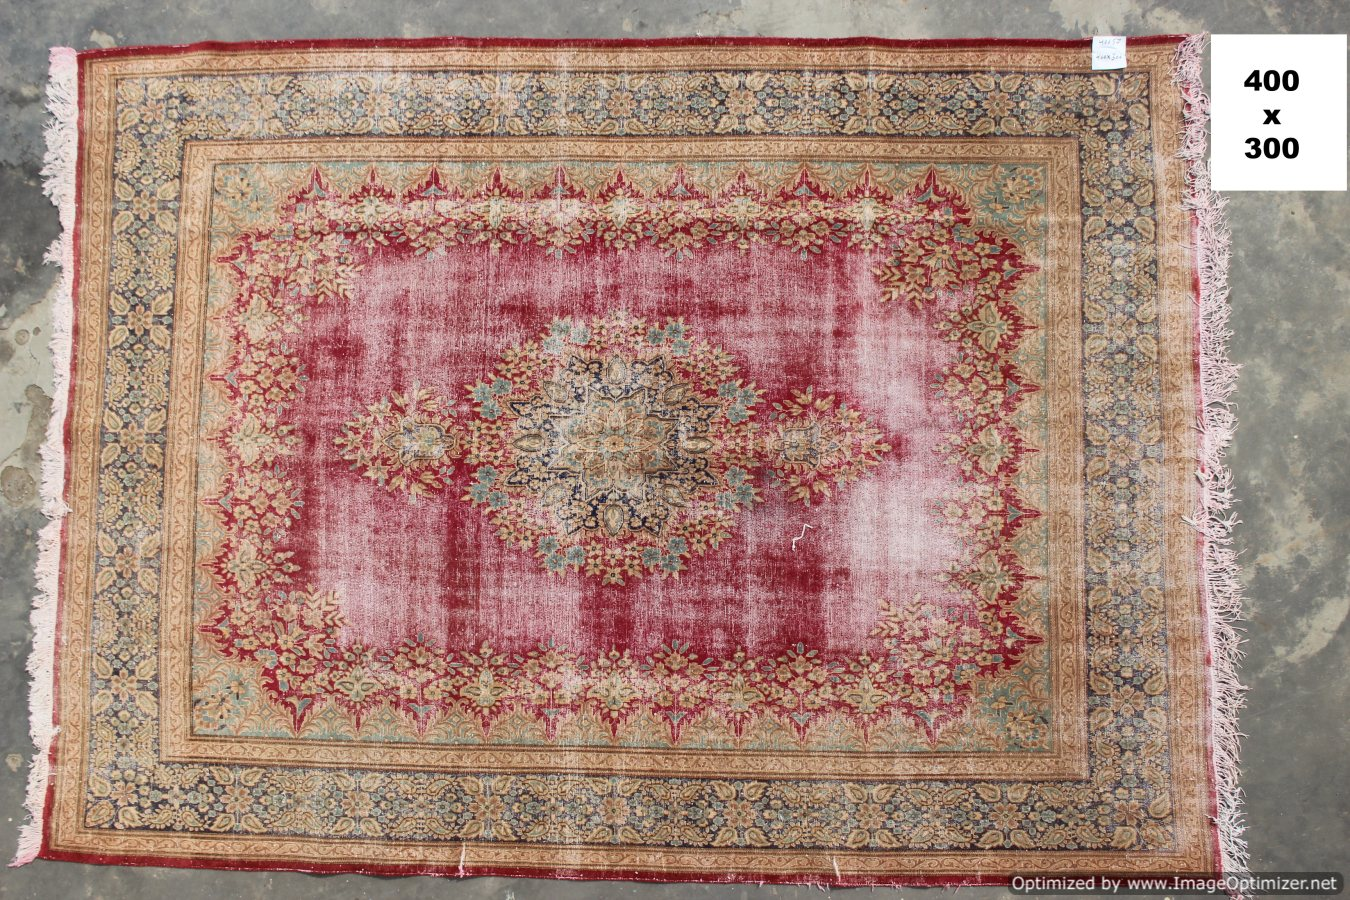 Vintage recoloured perzisch tapijt 40657 (400cm x 300cm)